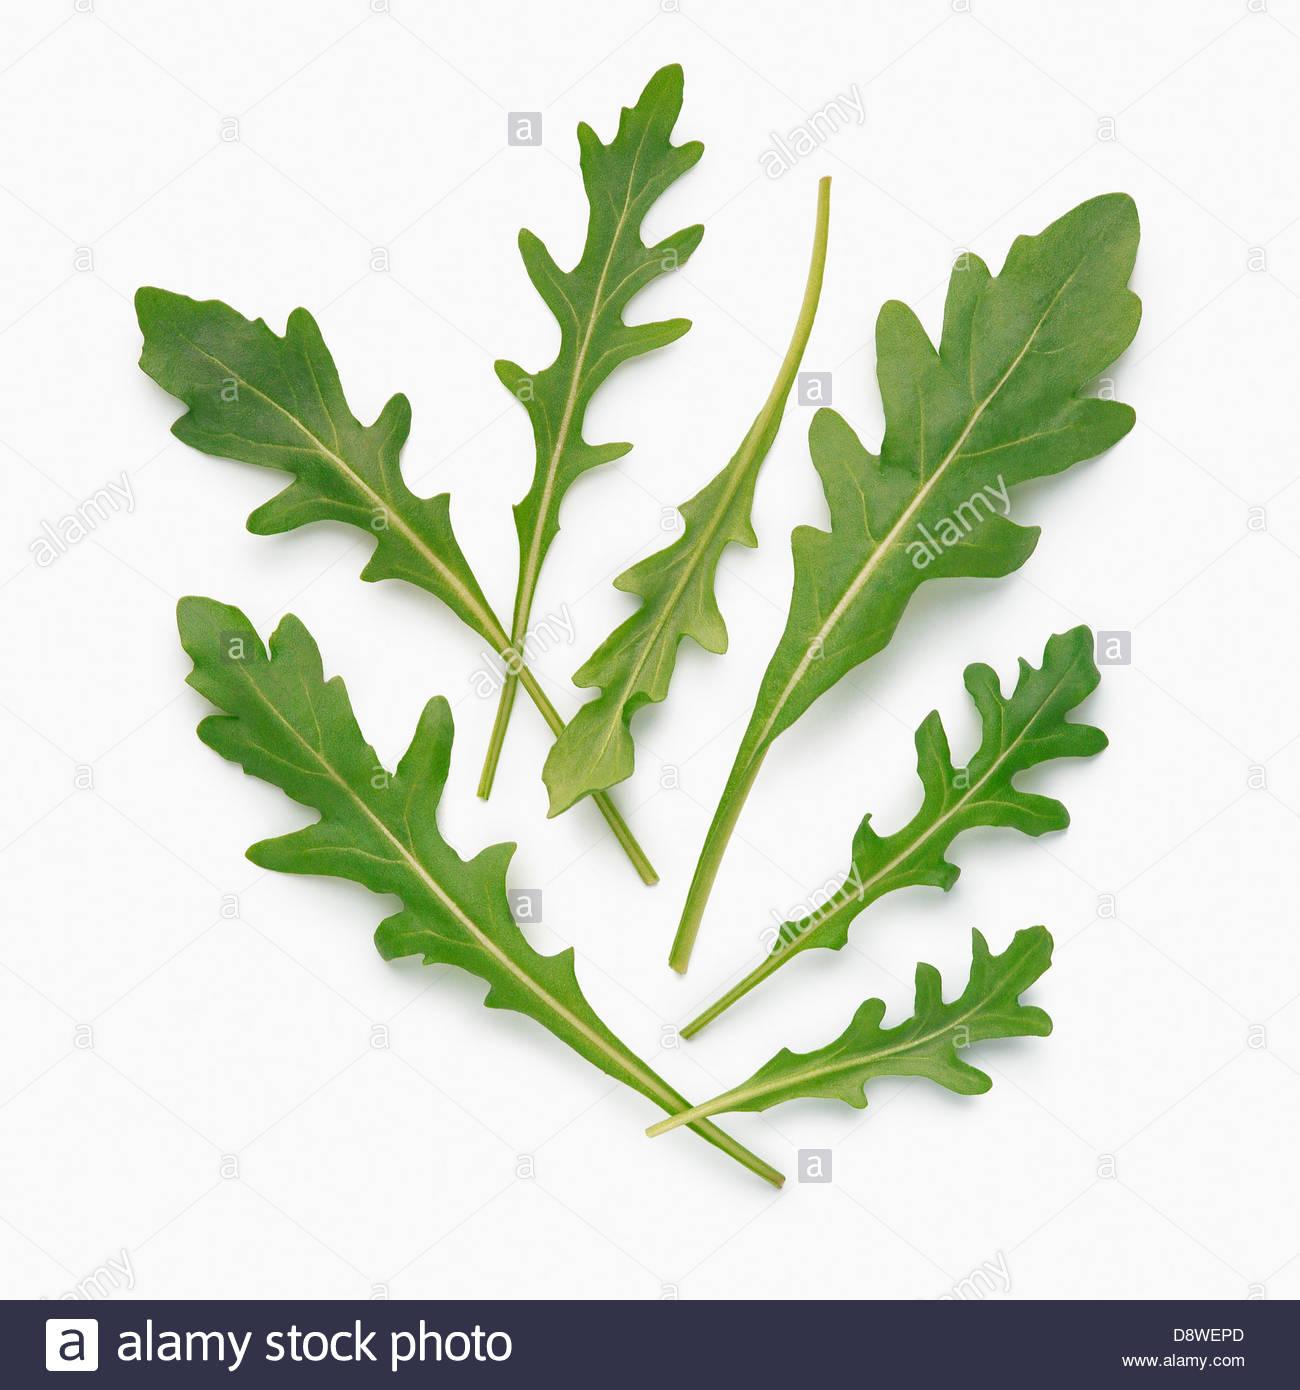 Rocket lettuce - Stock Image